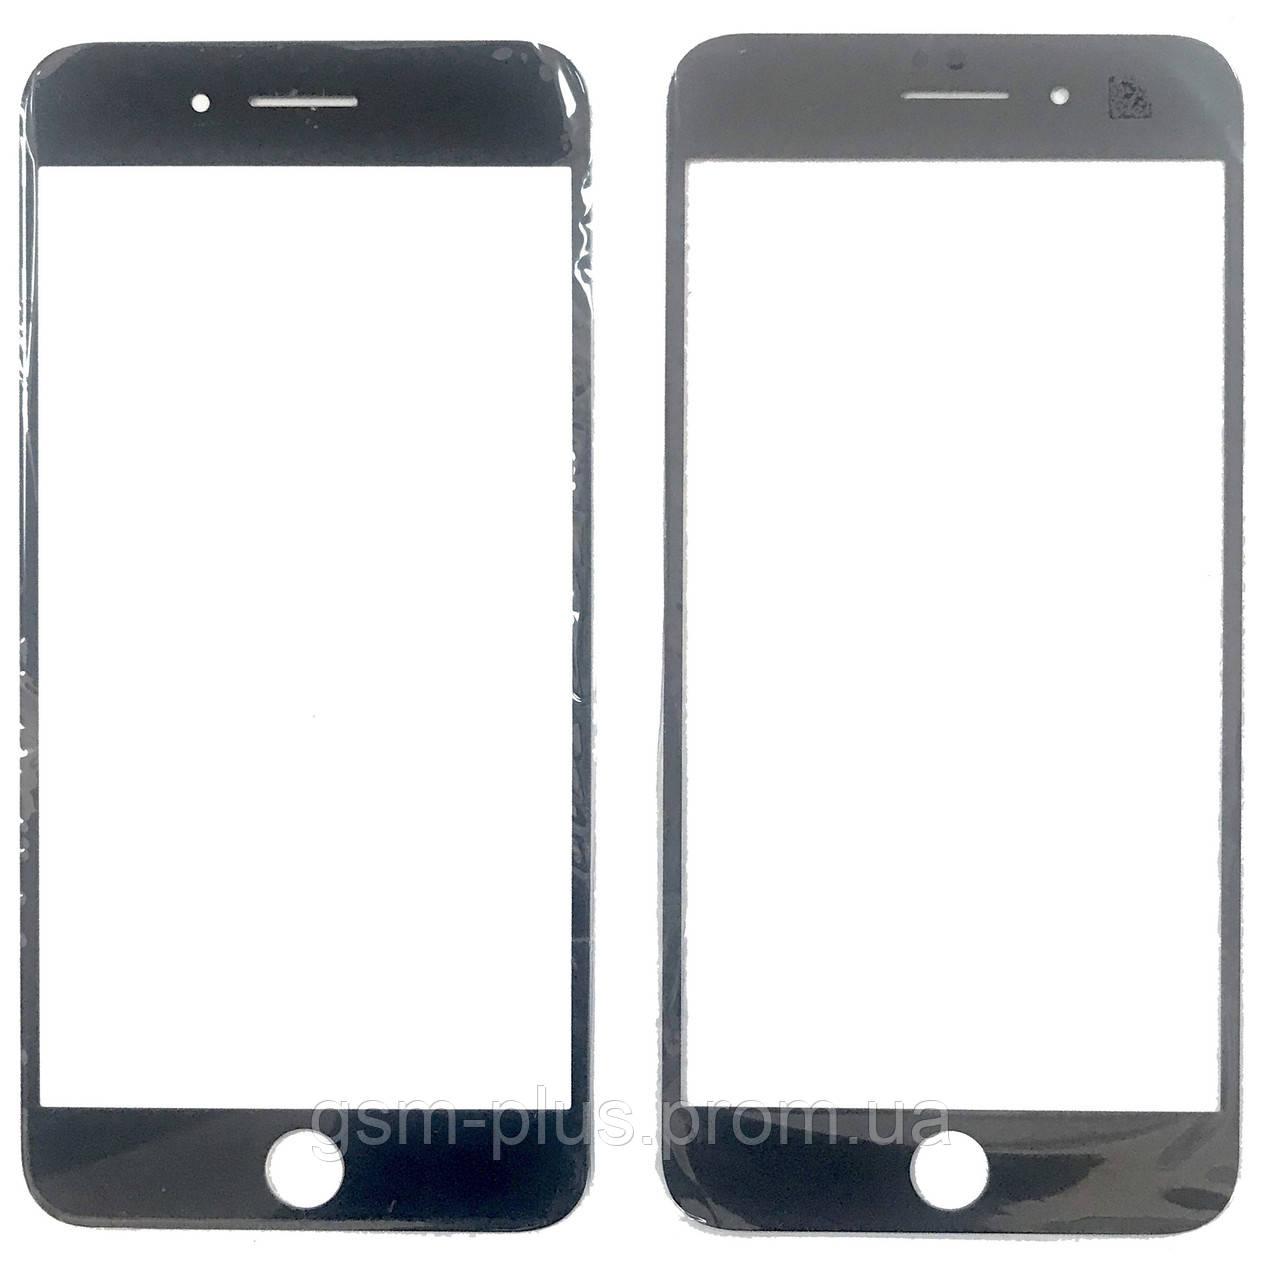 Стекло дисплея iPhone 8 Plus (5.5) Black (для переклейки)